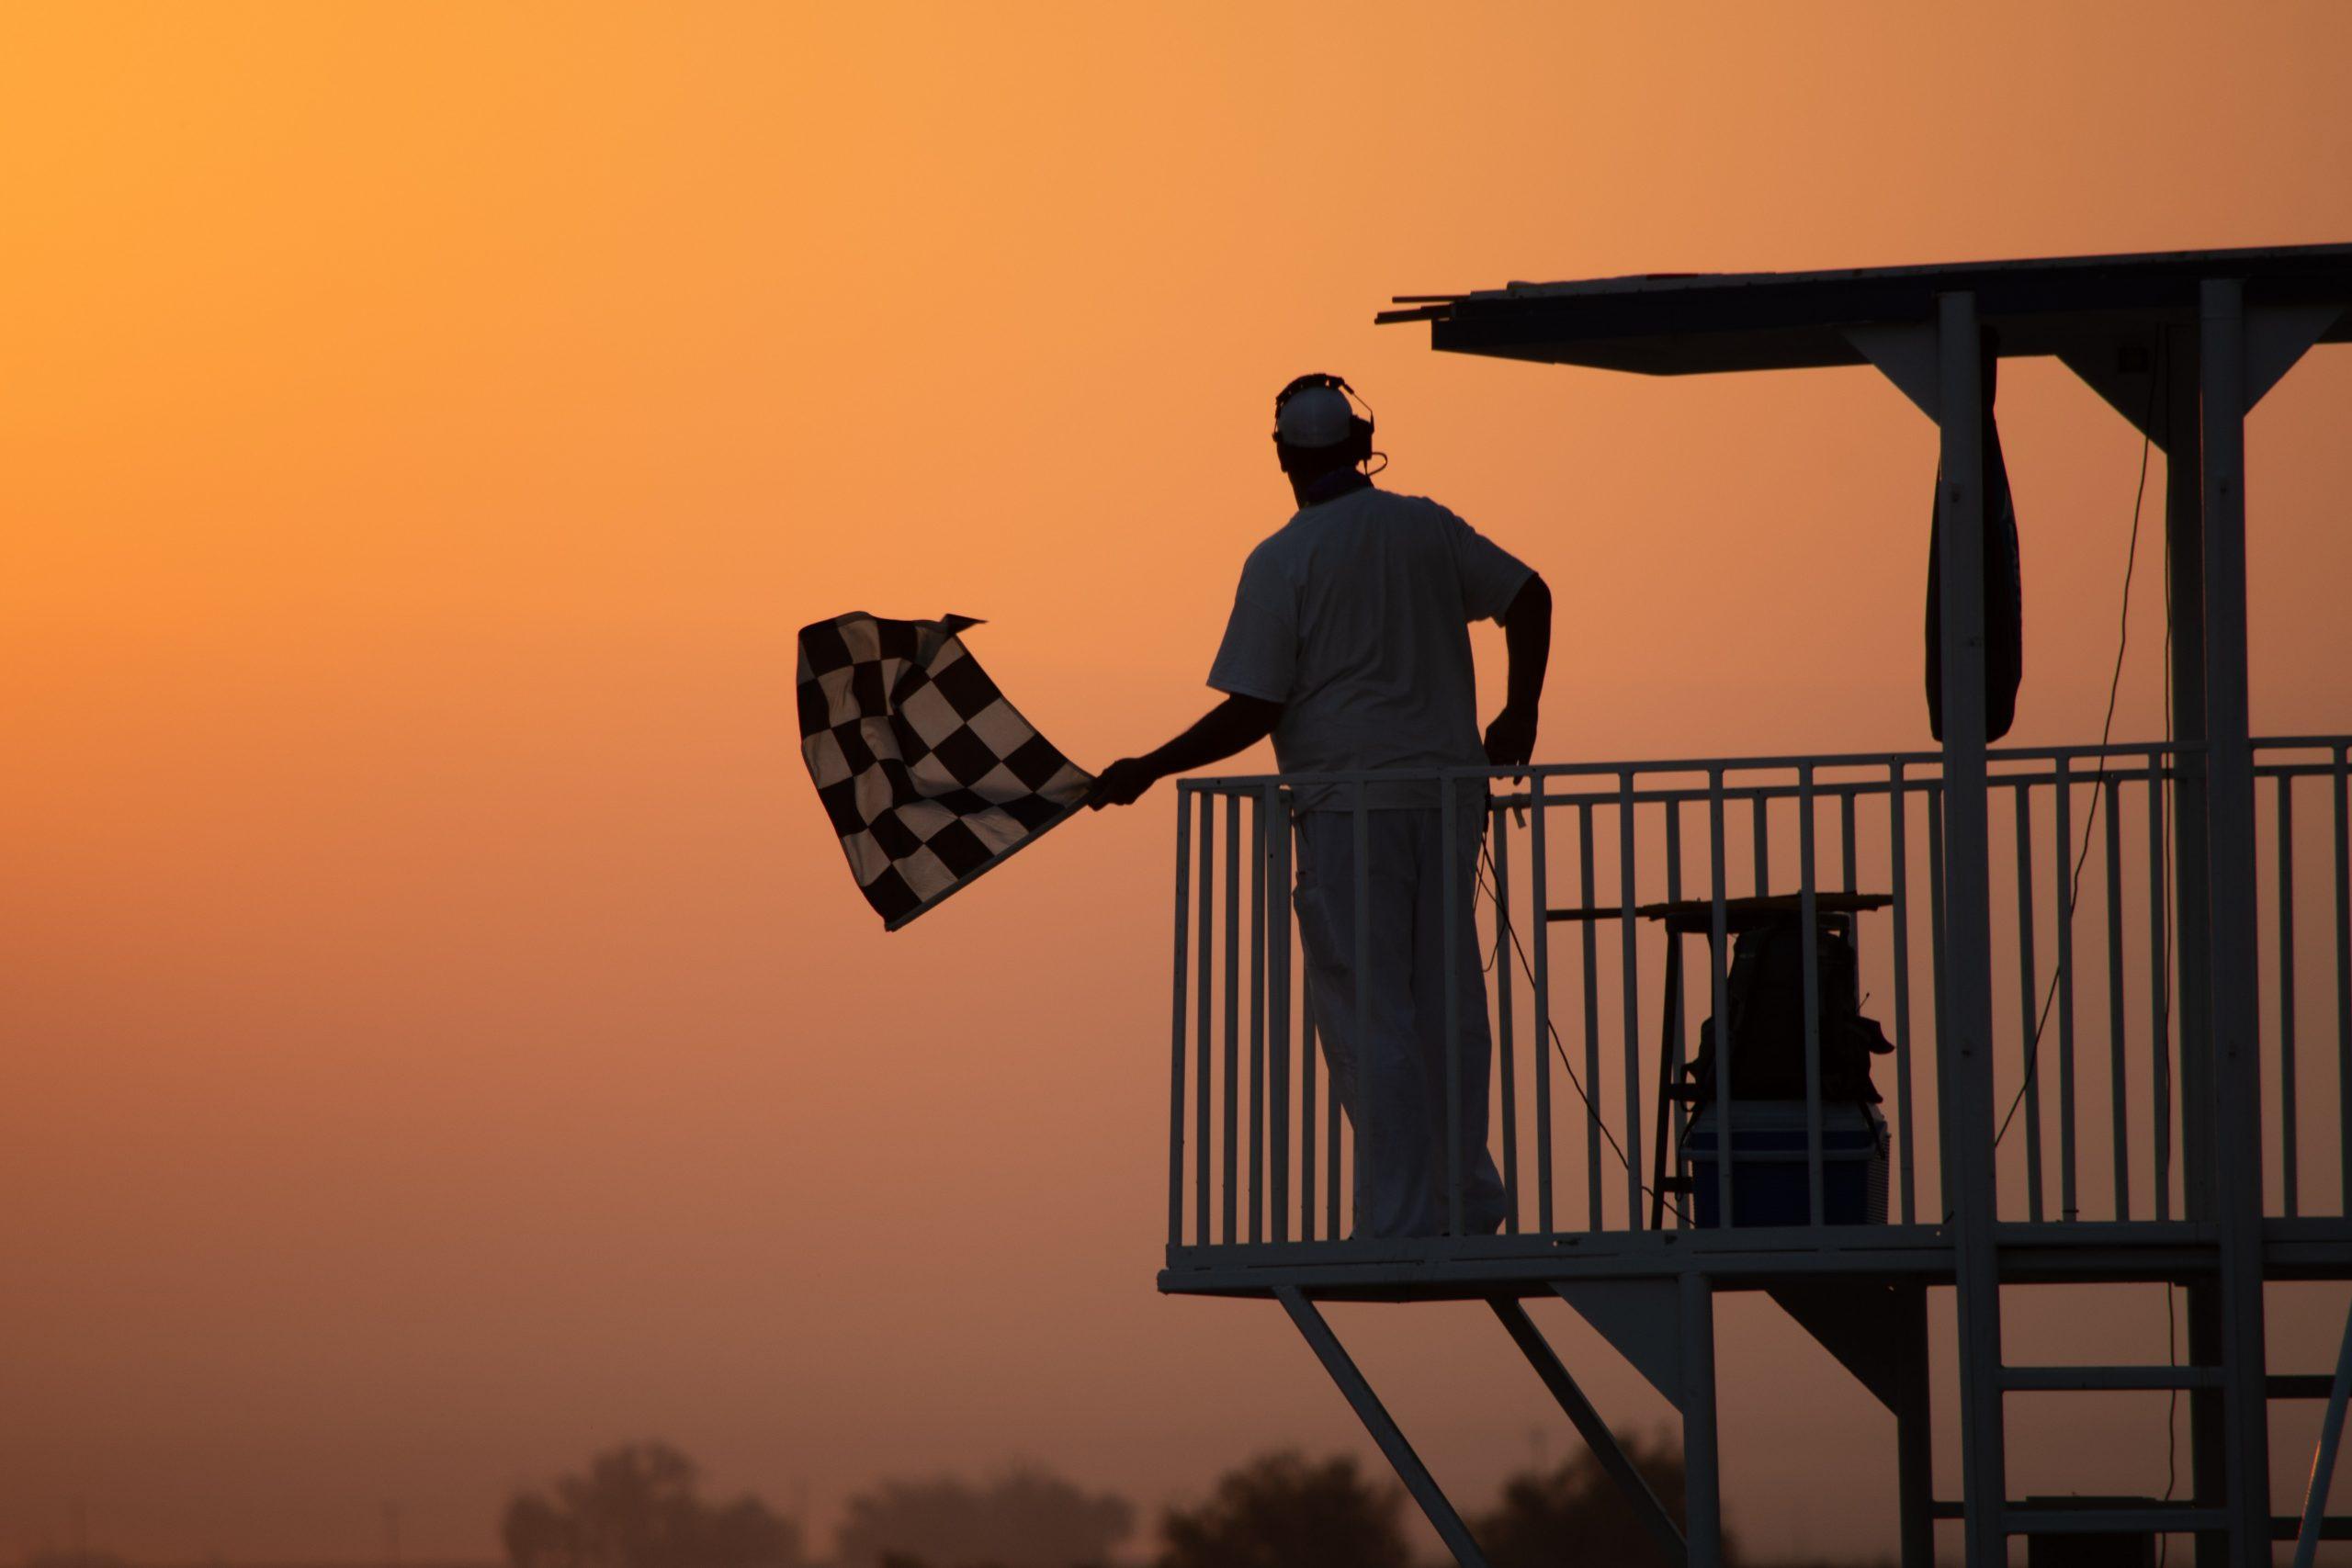 Track Day Trophy. Kolejna runda rajdu na toruńskim motorparku